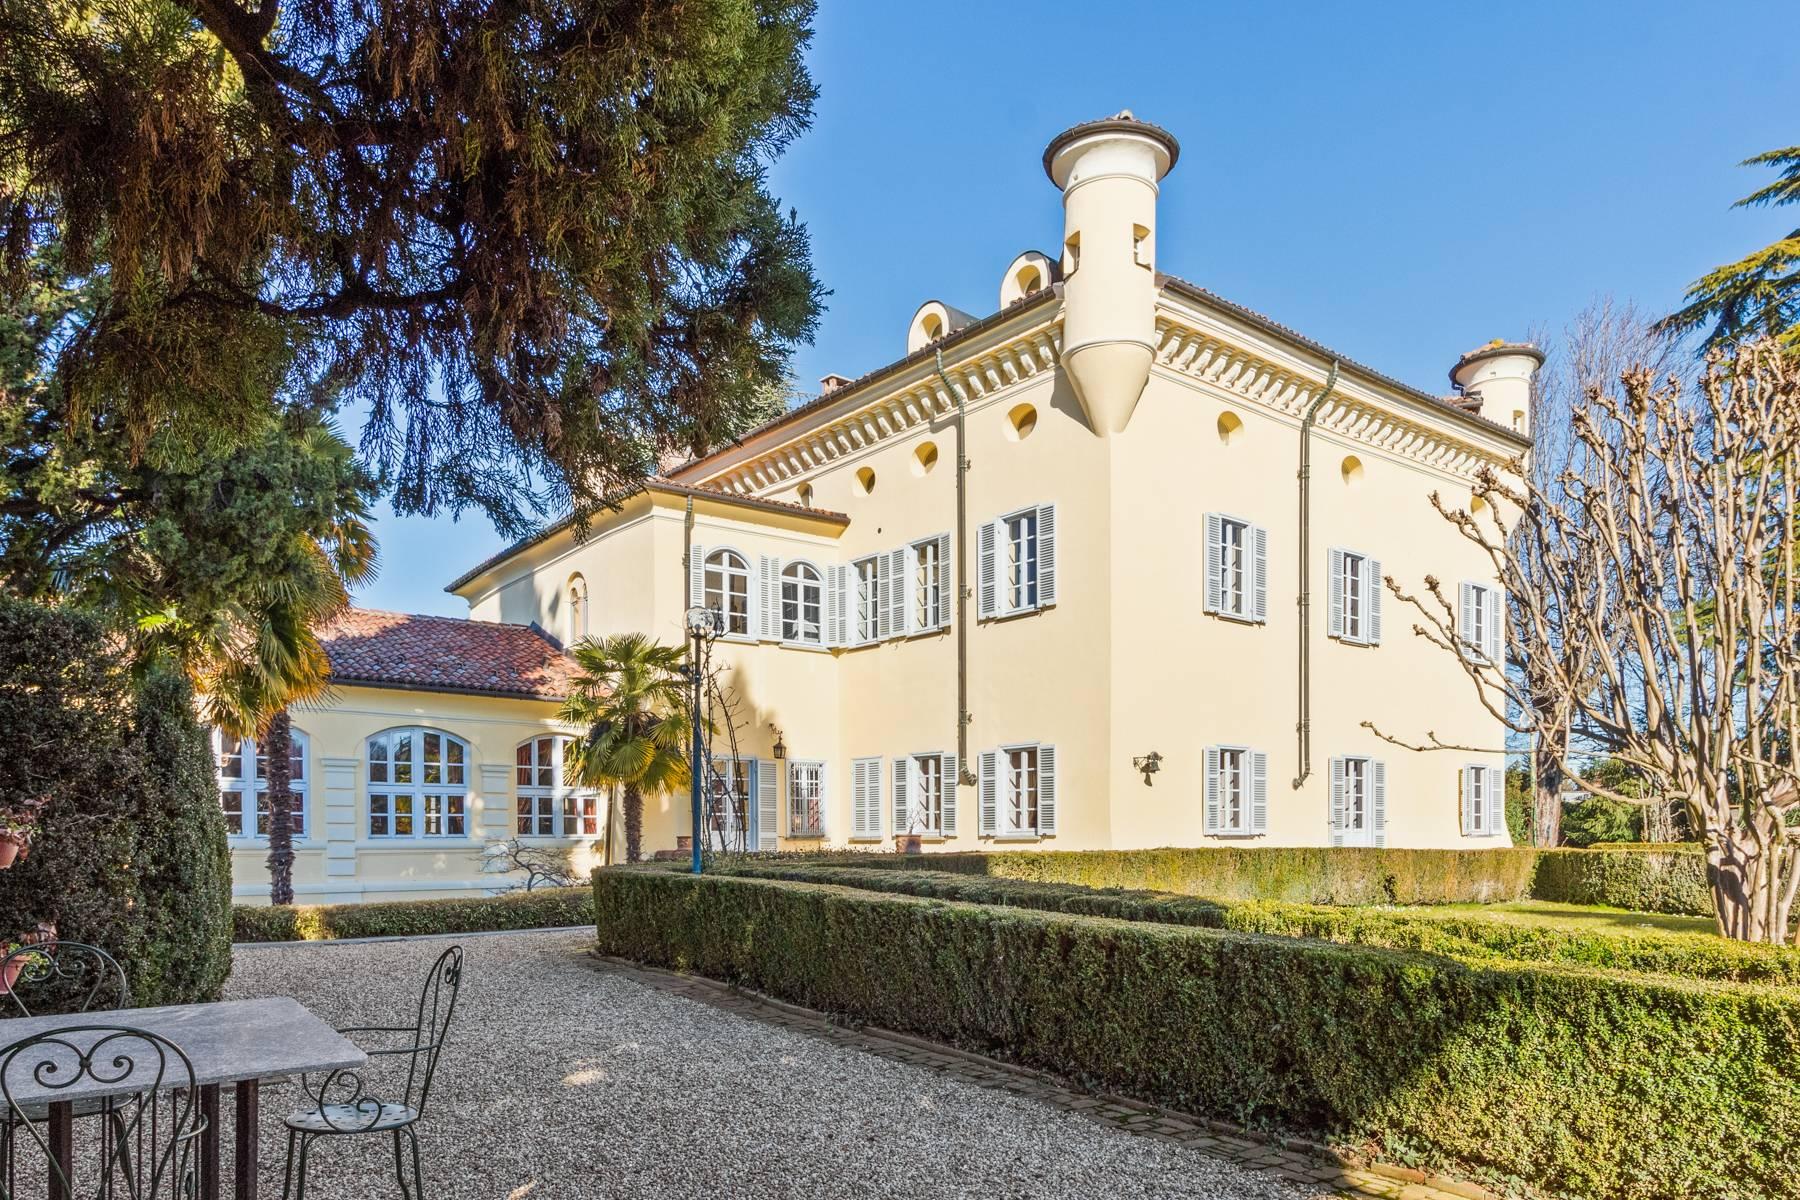 Villa in Vendita a Pino Torinese: 5 locali, 2087 mq - Foto 8